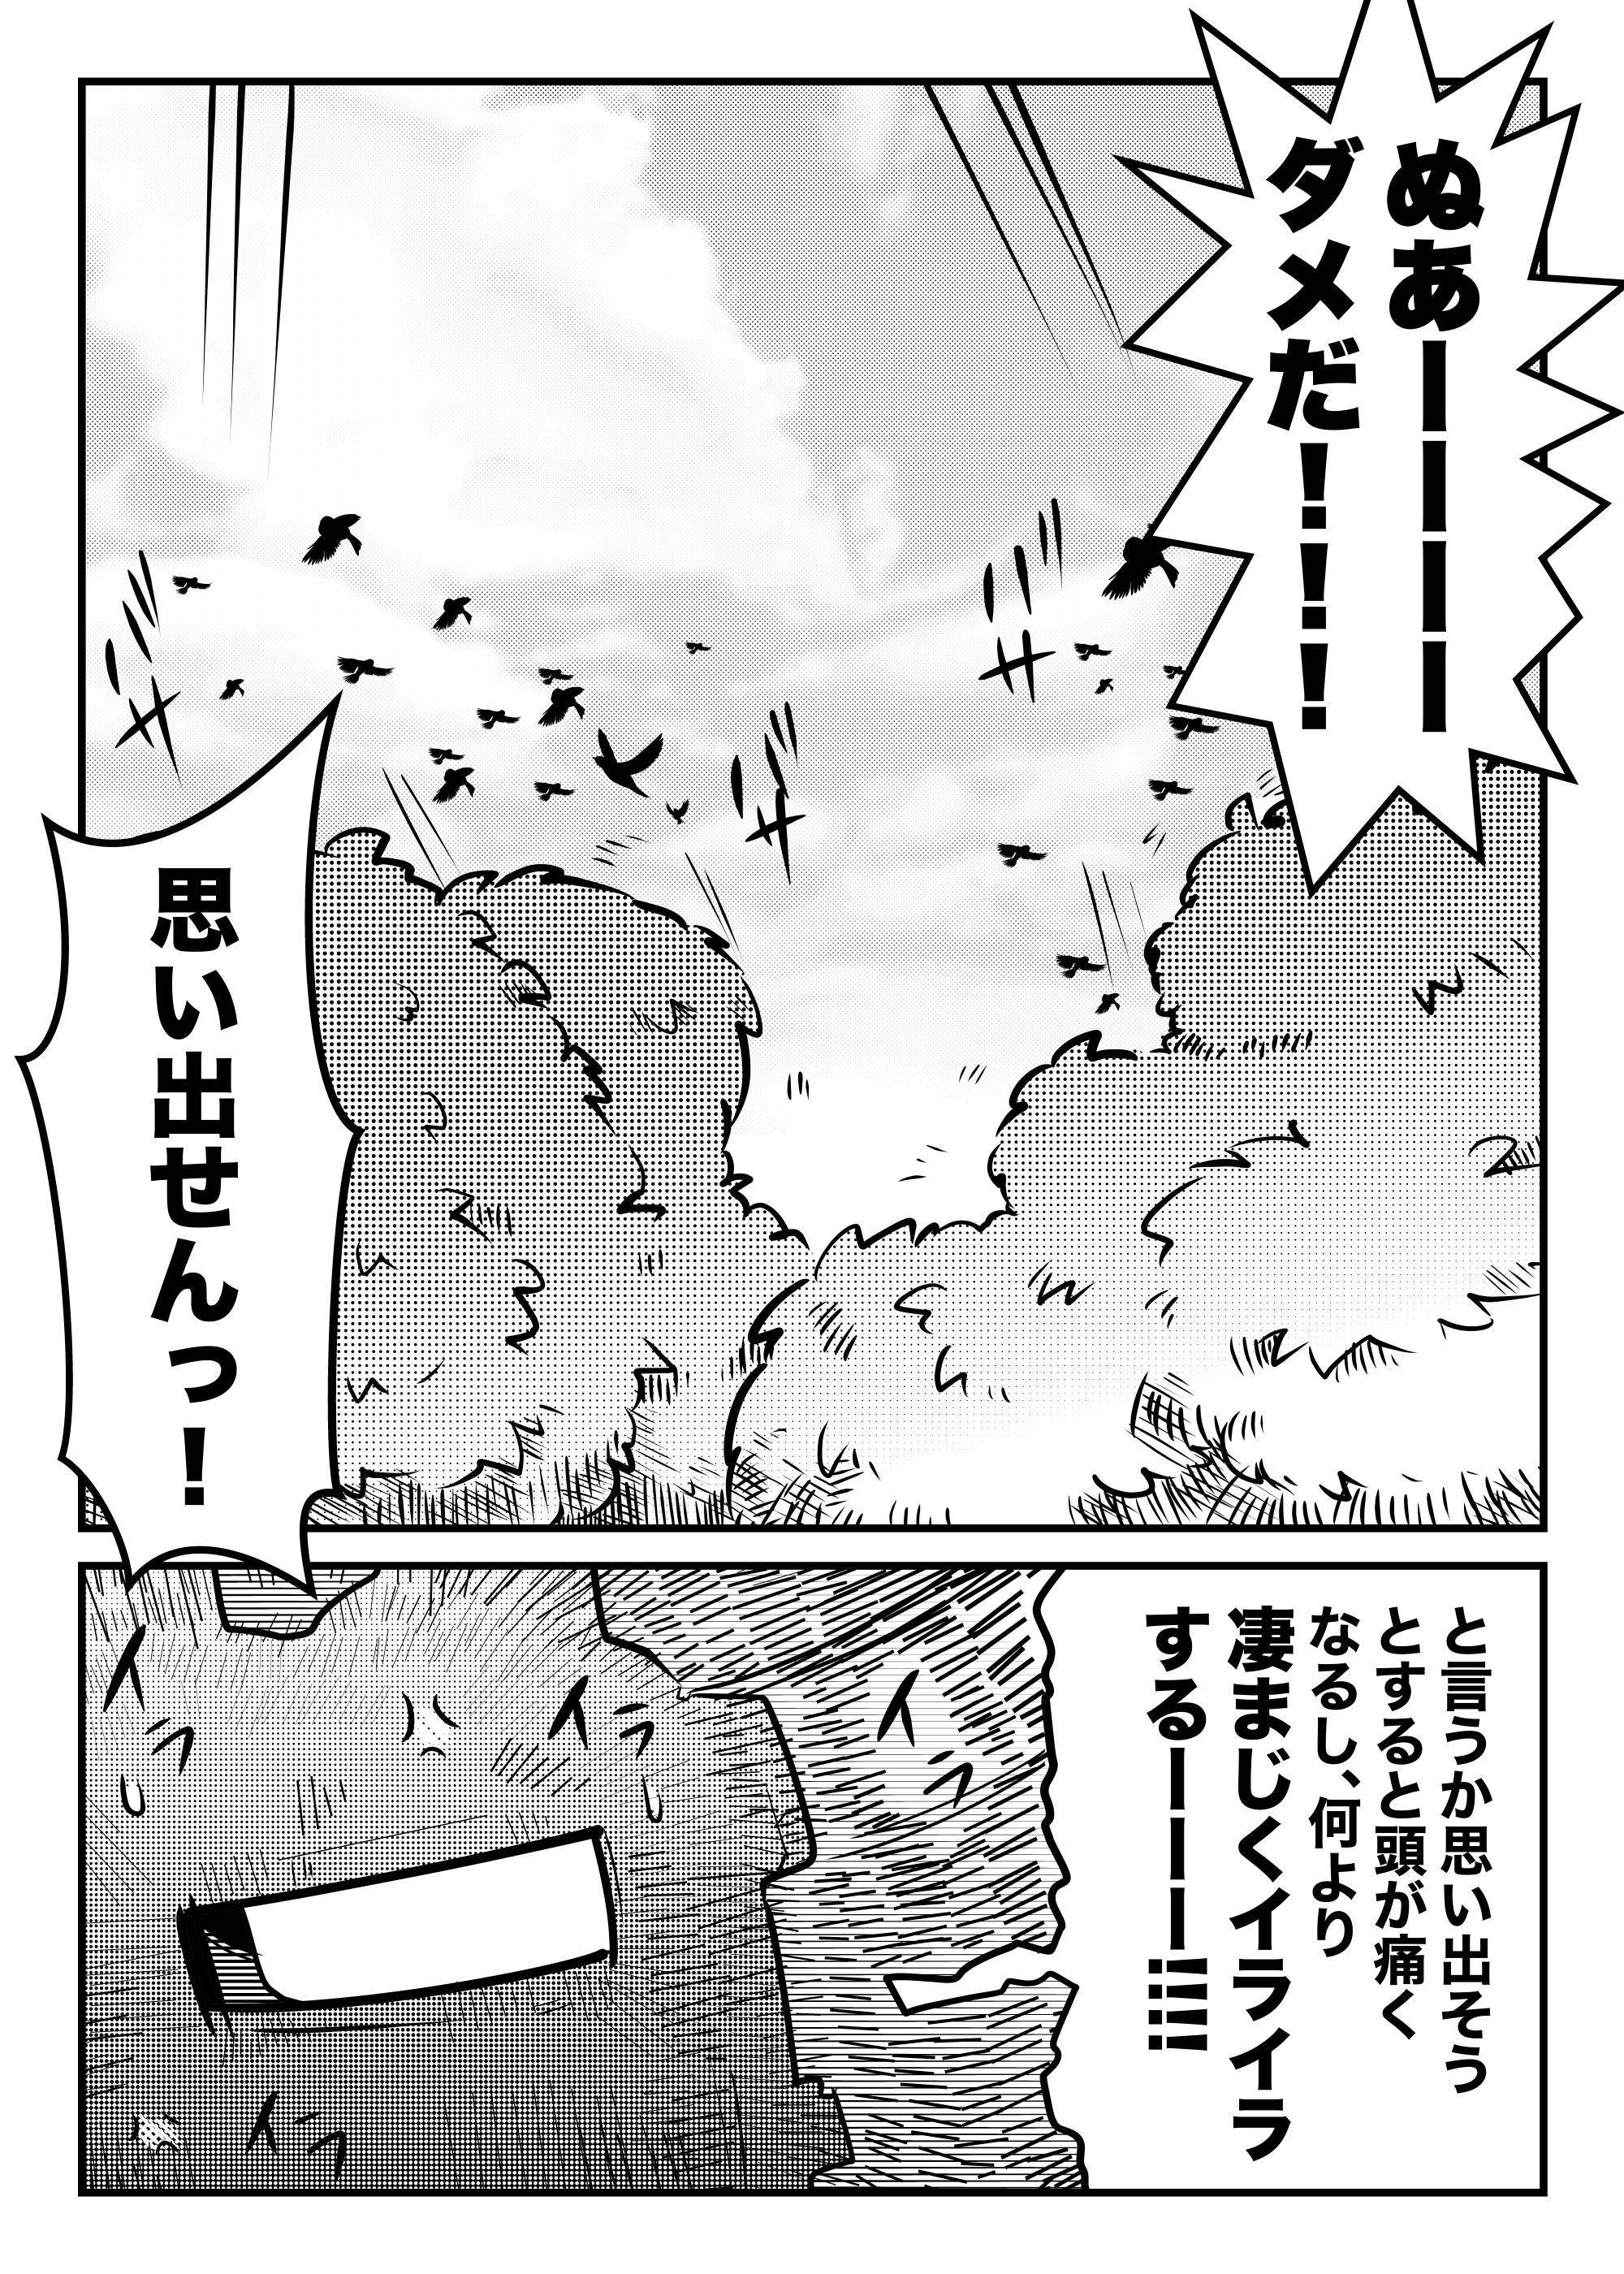 f:id:terashimaru117:20210914182939p:plain